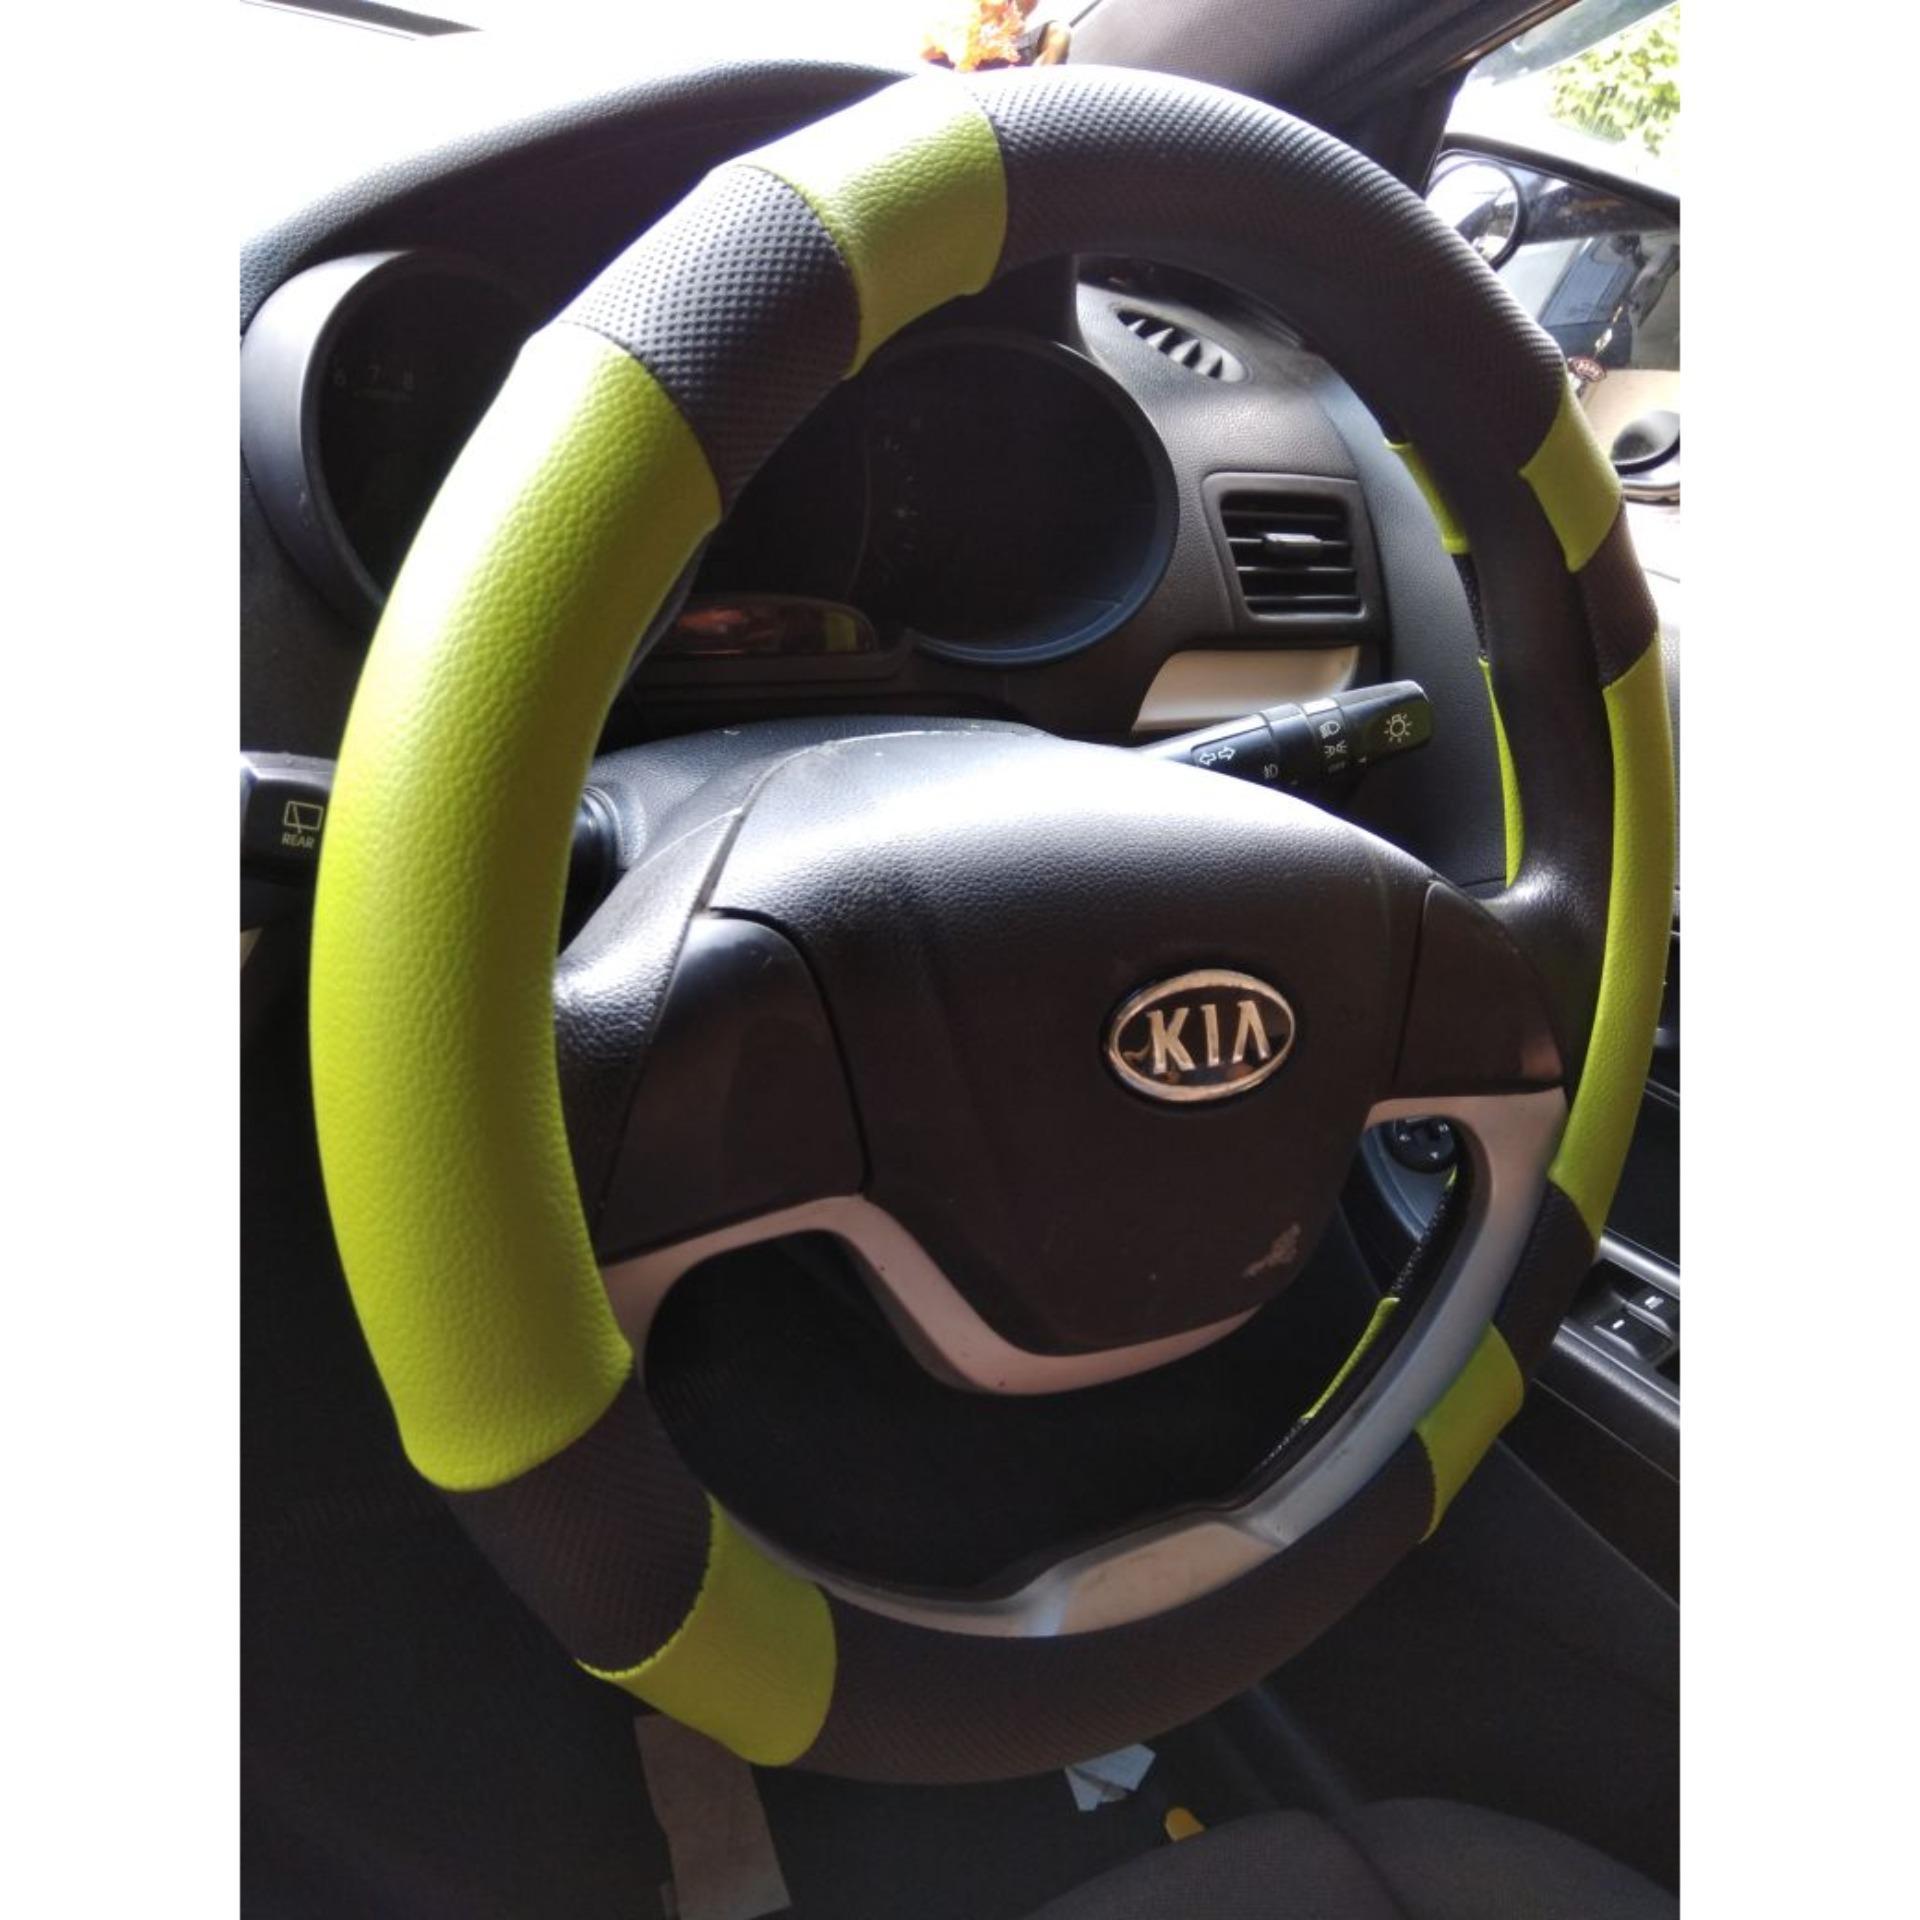 Beli Cover Stir Sarung Setir Mobil Ultimate Dash Hijau Size S Cicilan